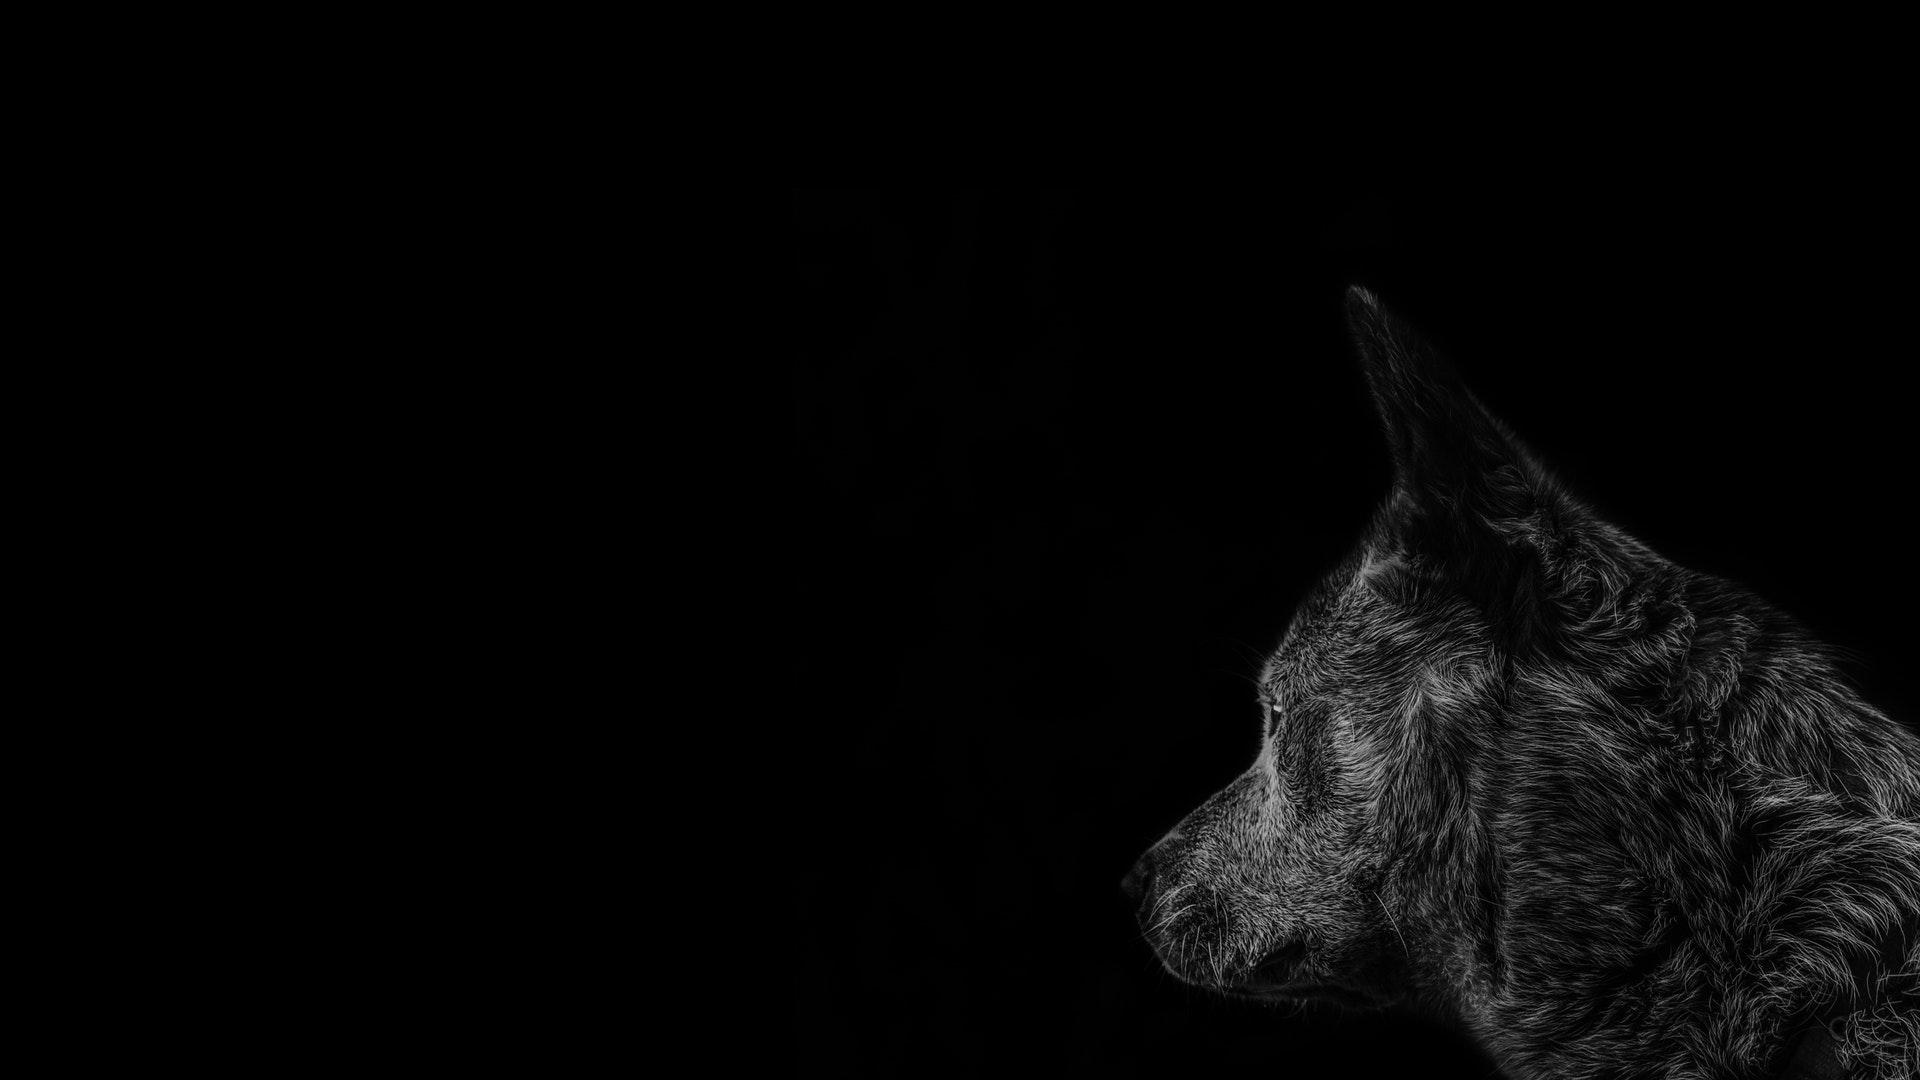 عکس زمینه گرگ خاکستری مشکی تیره پس زمینه